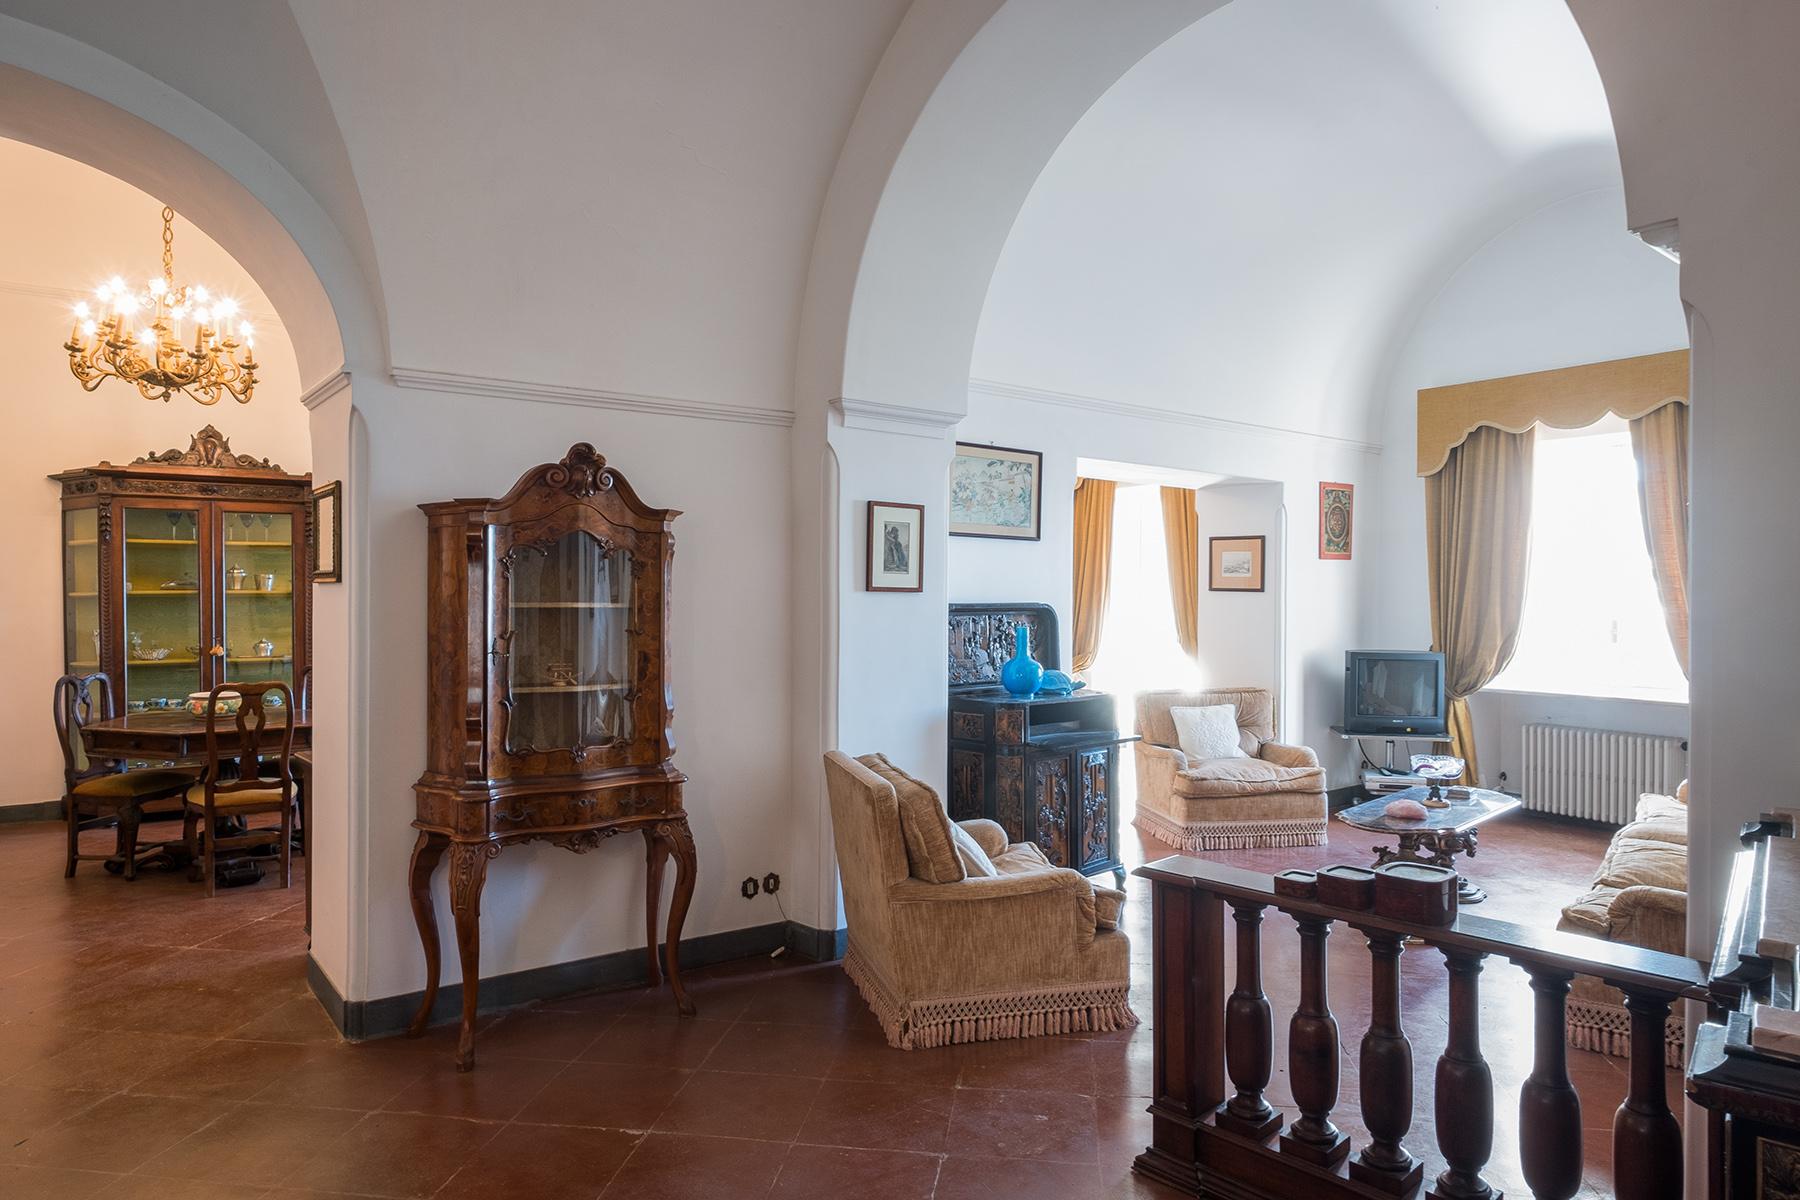 Casa indipendente in Vendita a Capri: 5 locali, 400 mq - Foto 7